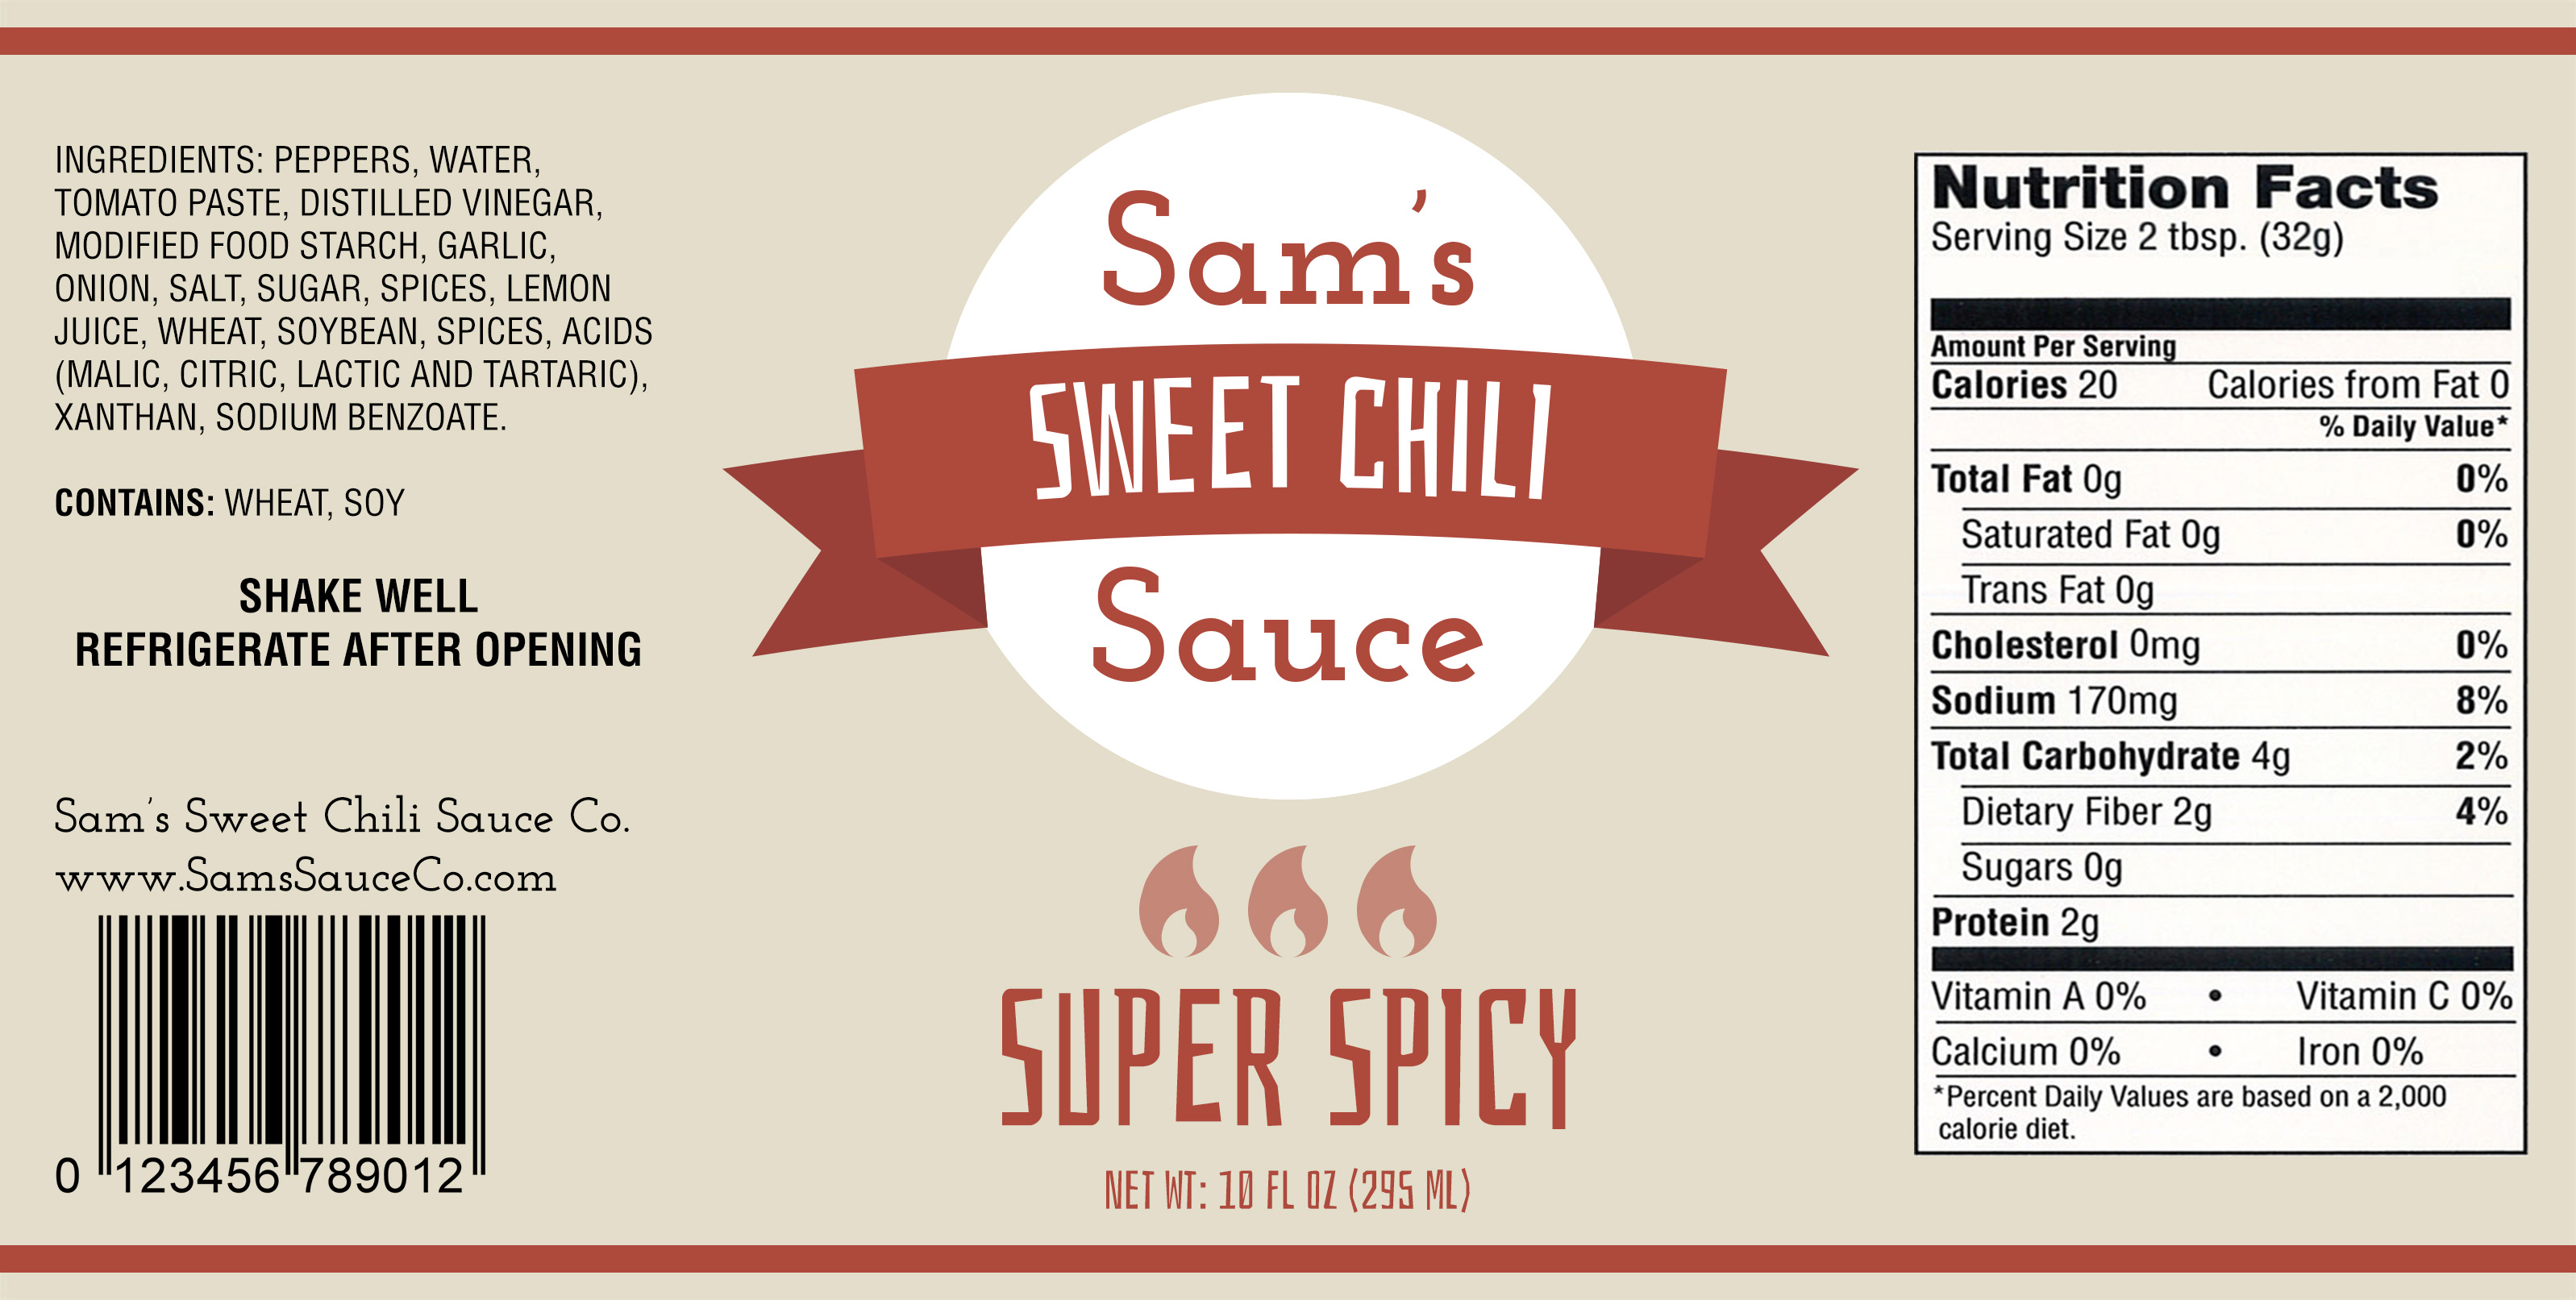 Super Spicy Sauce